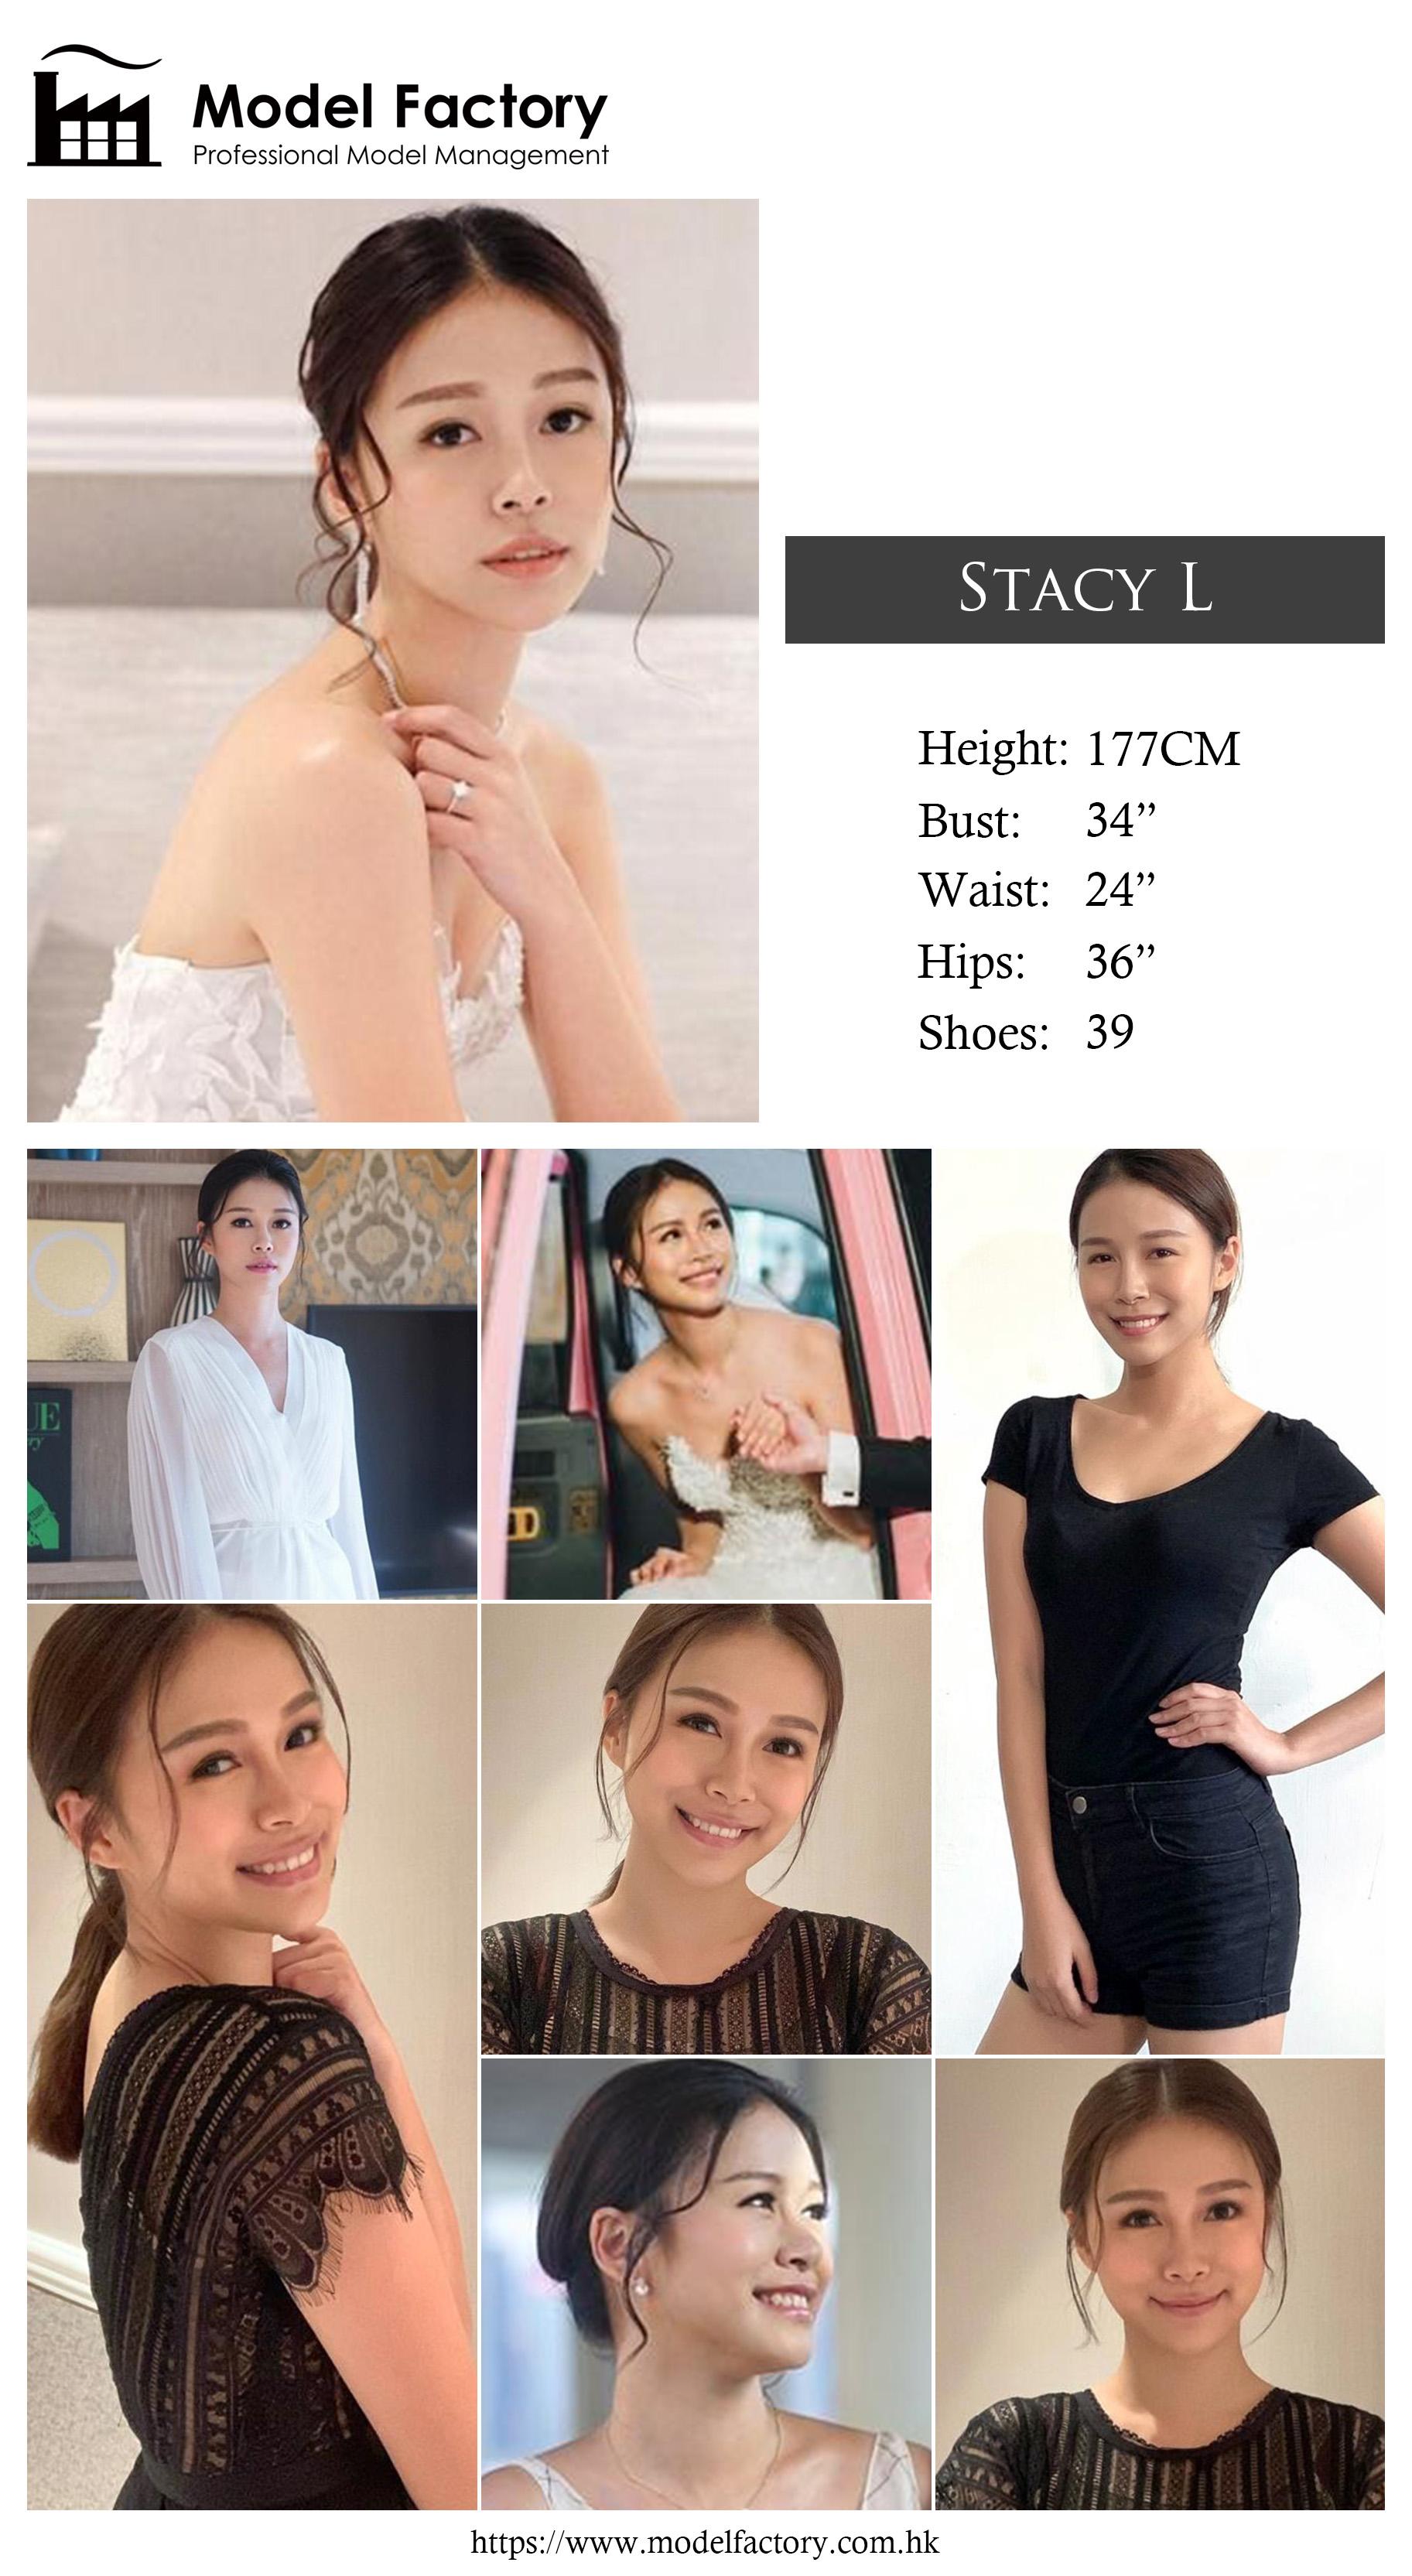 model agency hk Stacy L